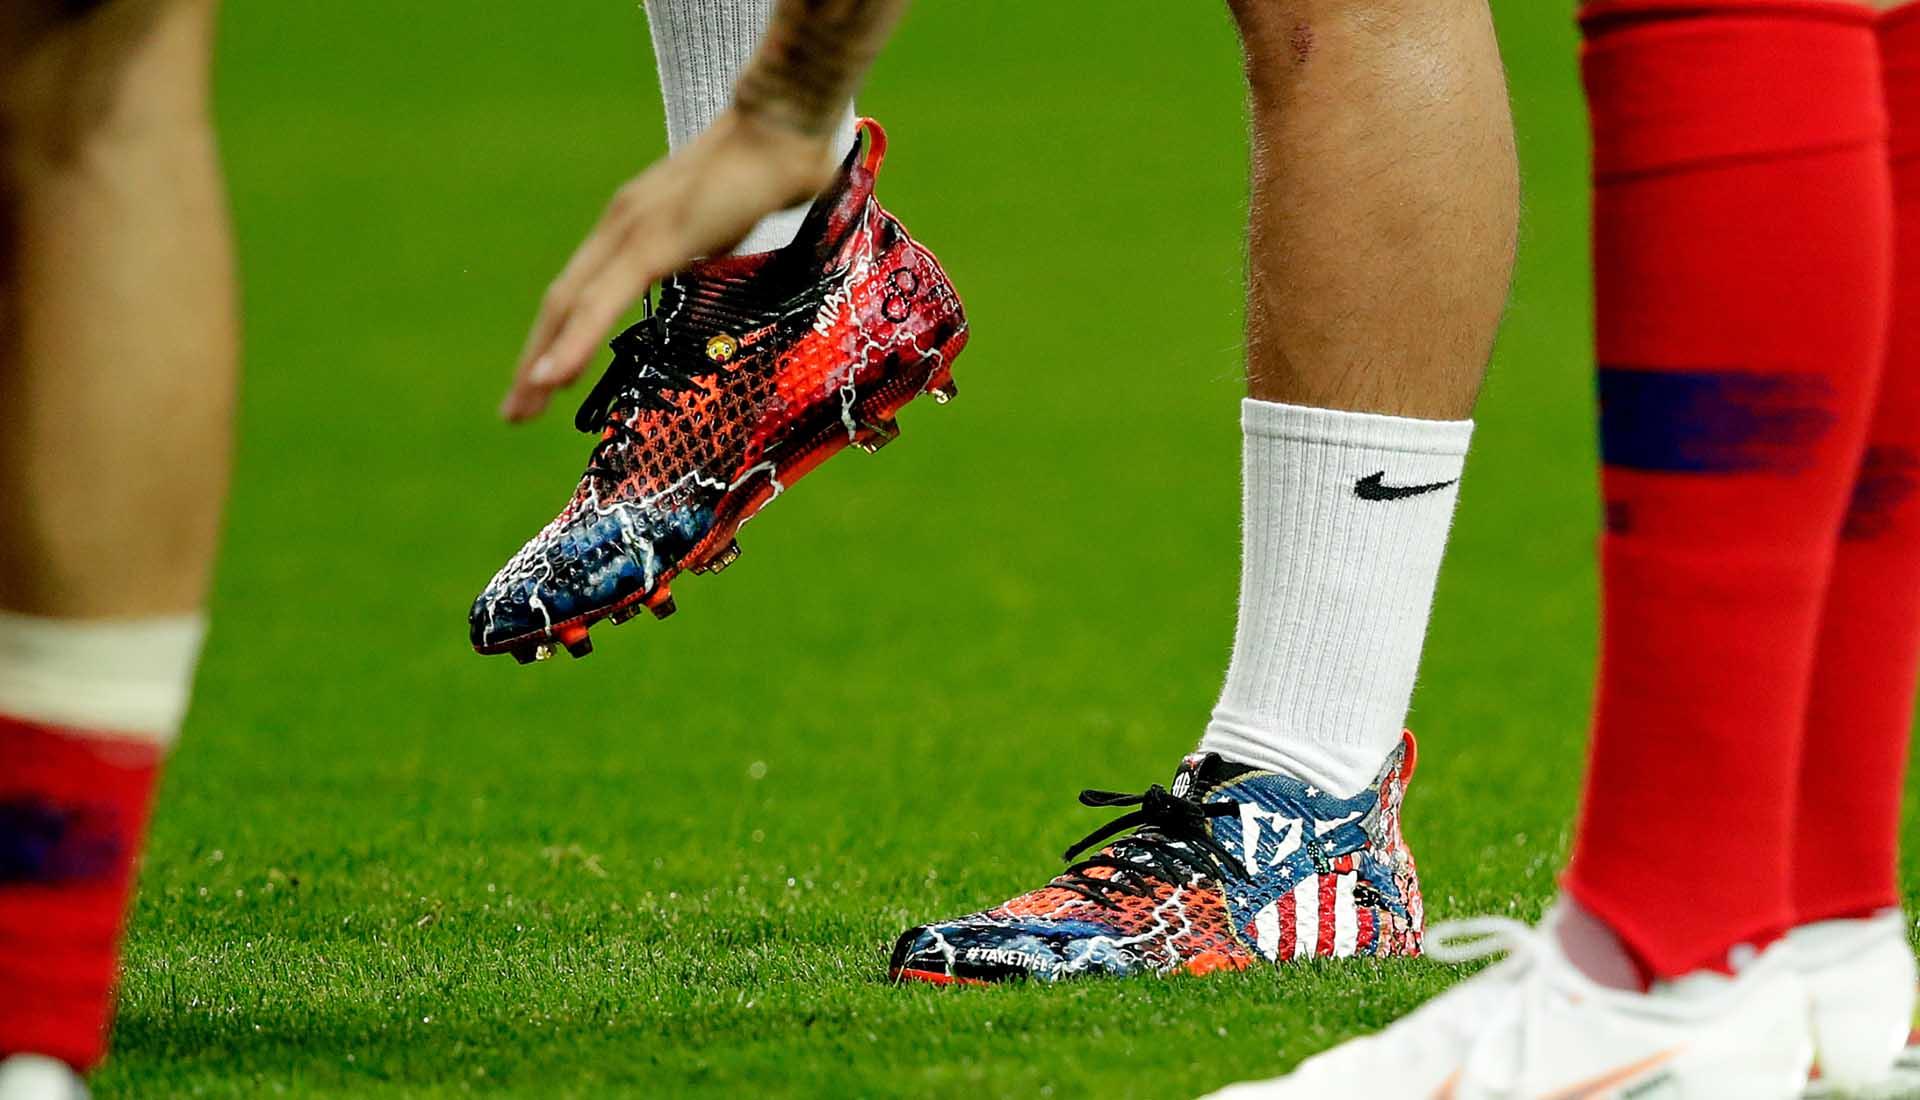 Antoine Griezmann Wears Custom Designed PUMA Future Boots